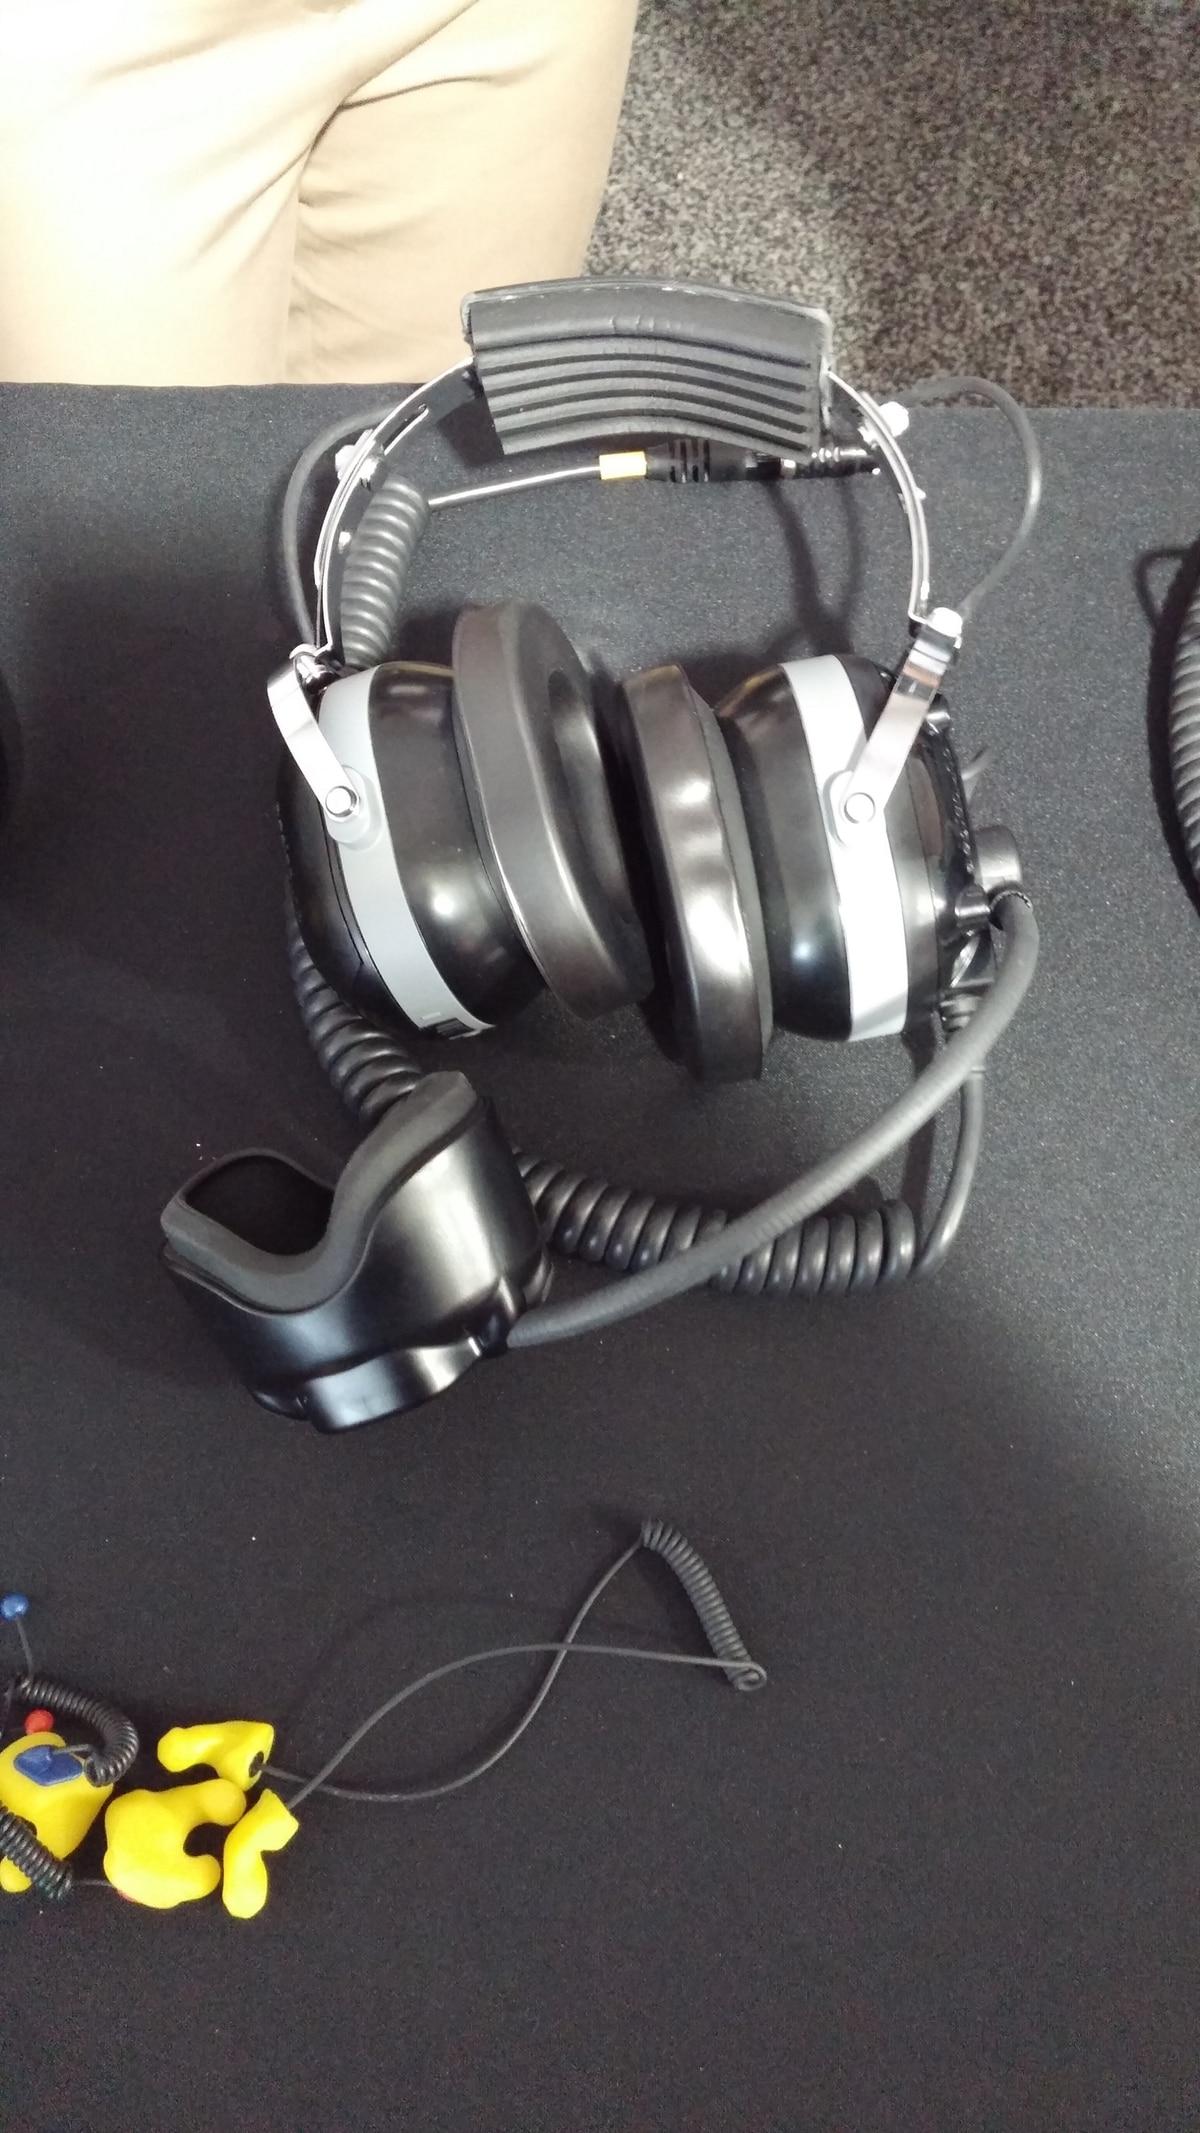 Flight Deck Headset Compensates for F-35 Engine Noise